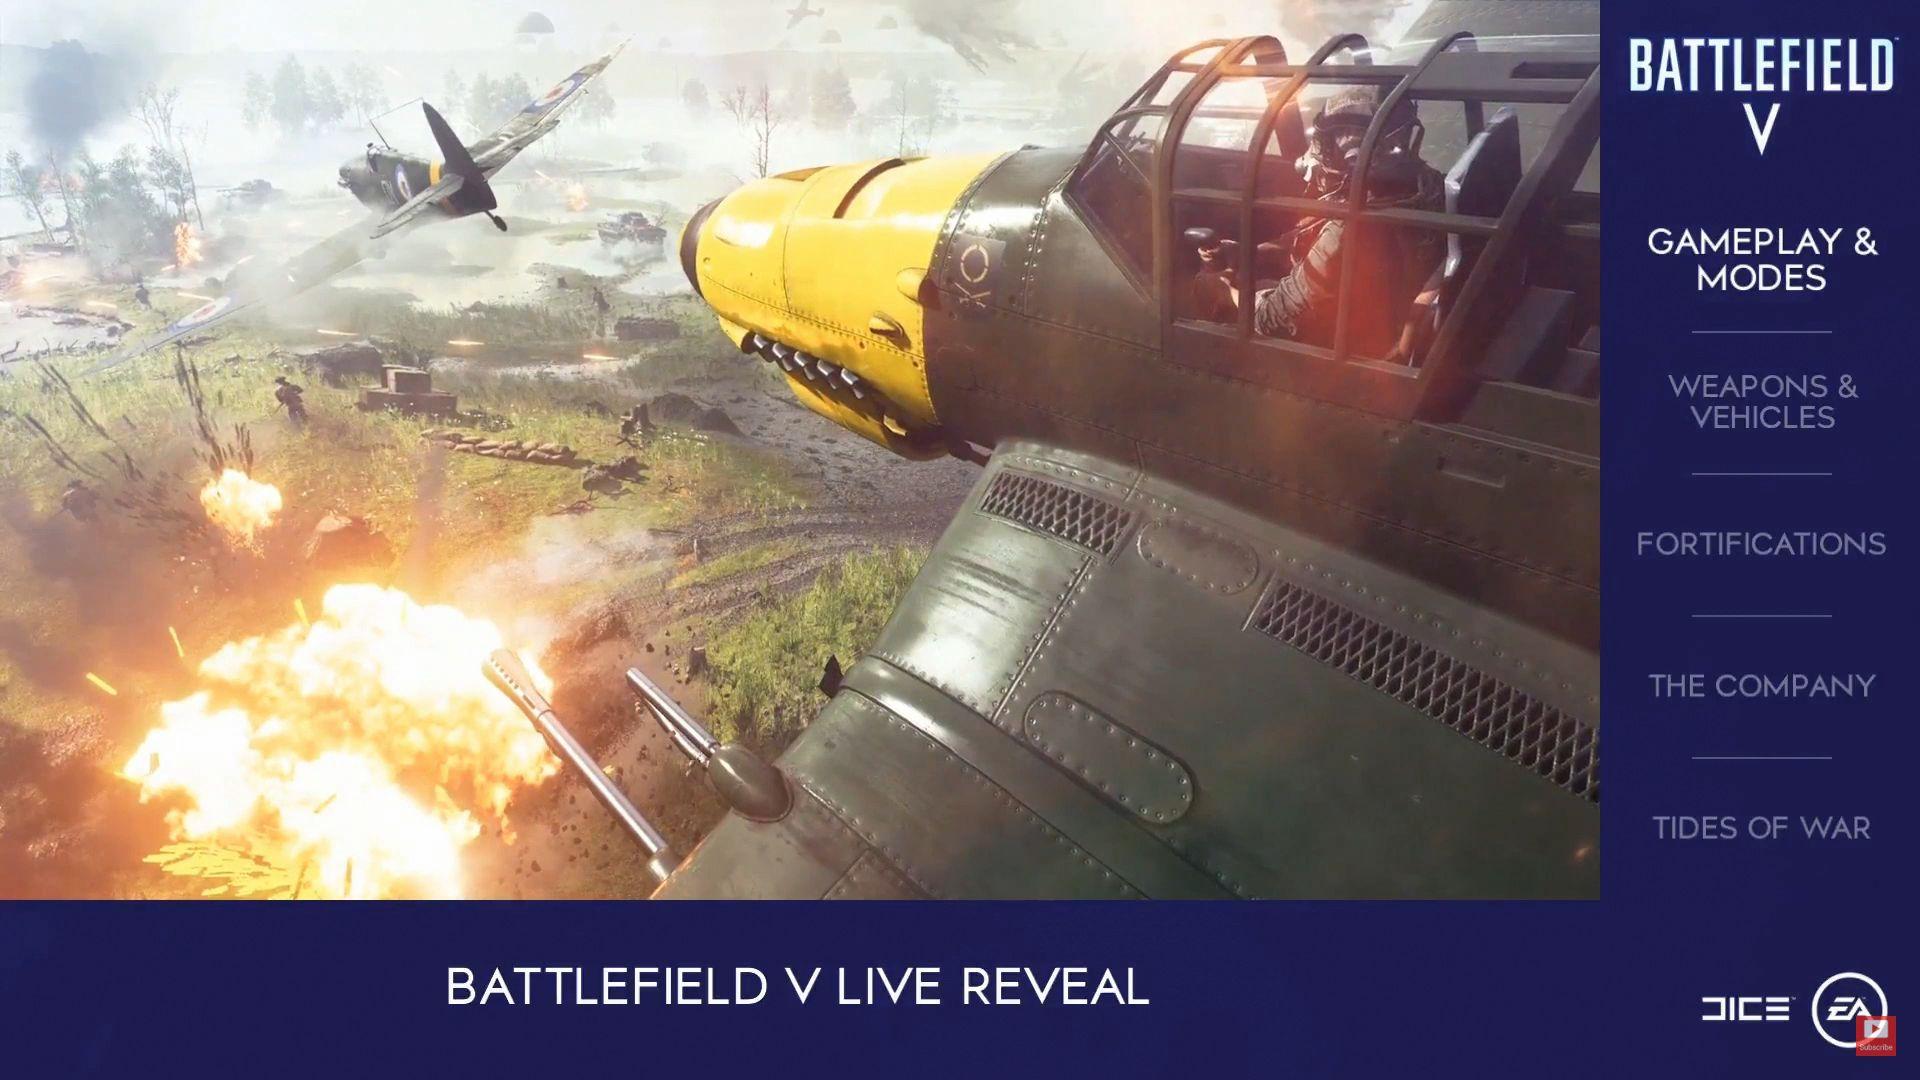 WW2 Setting Confirmed In Battlefield 5 Live Reveal Shacknews